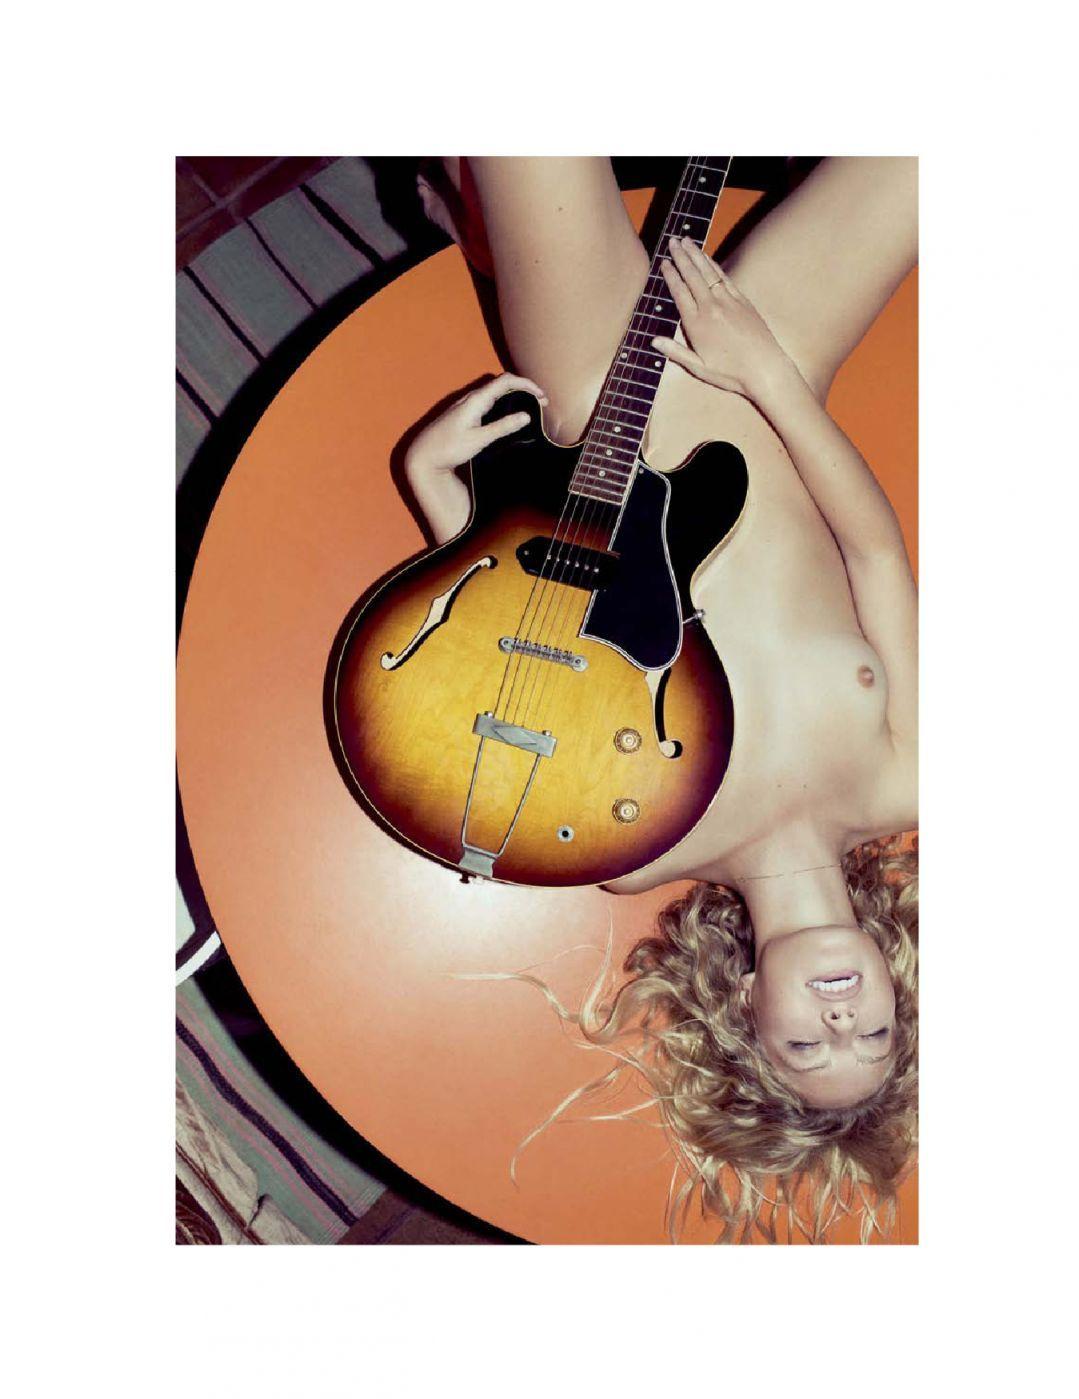 Leila Spilman nudes (85 photo) Hot, iCloud, see through